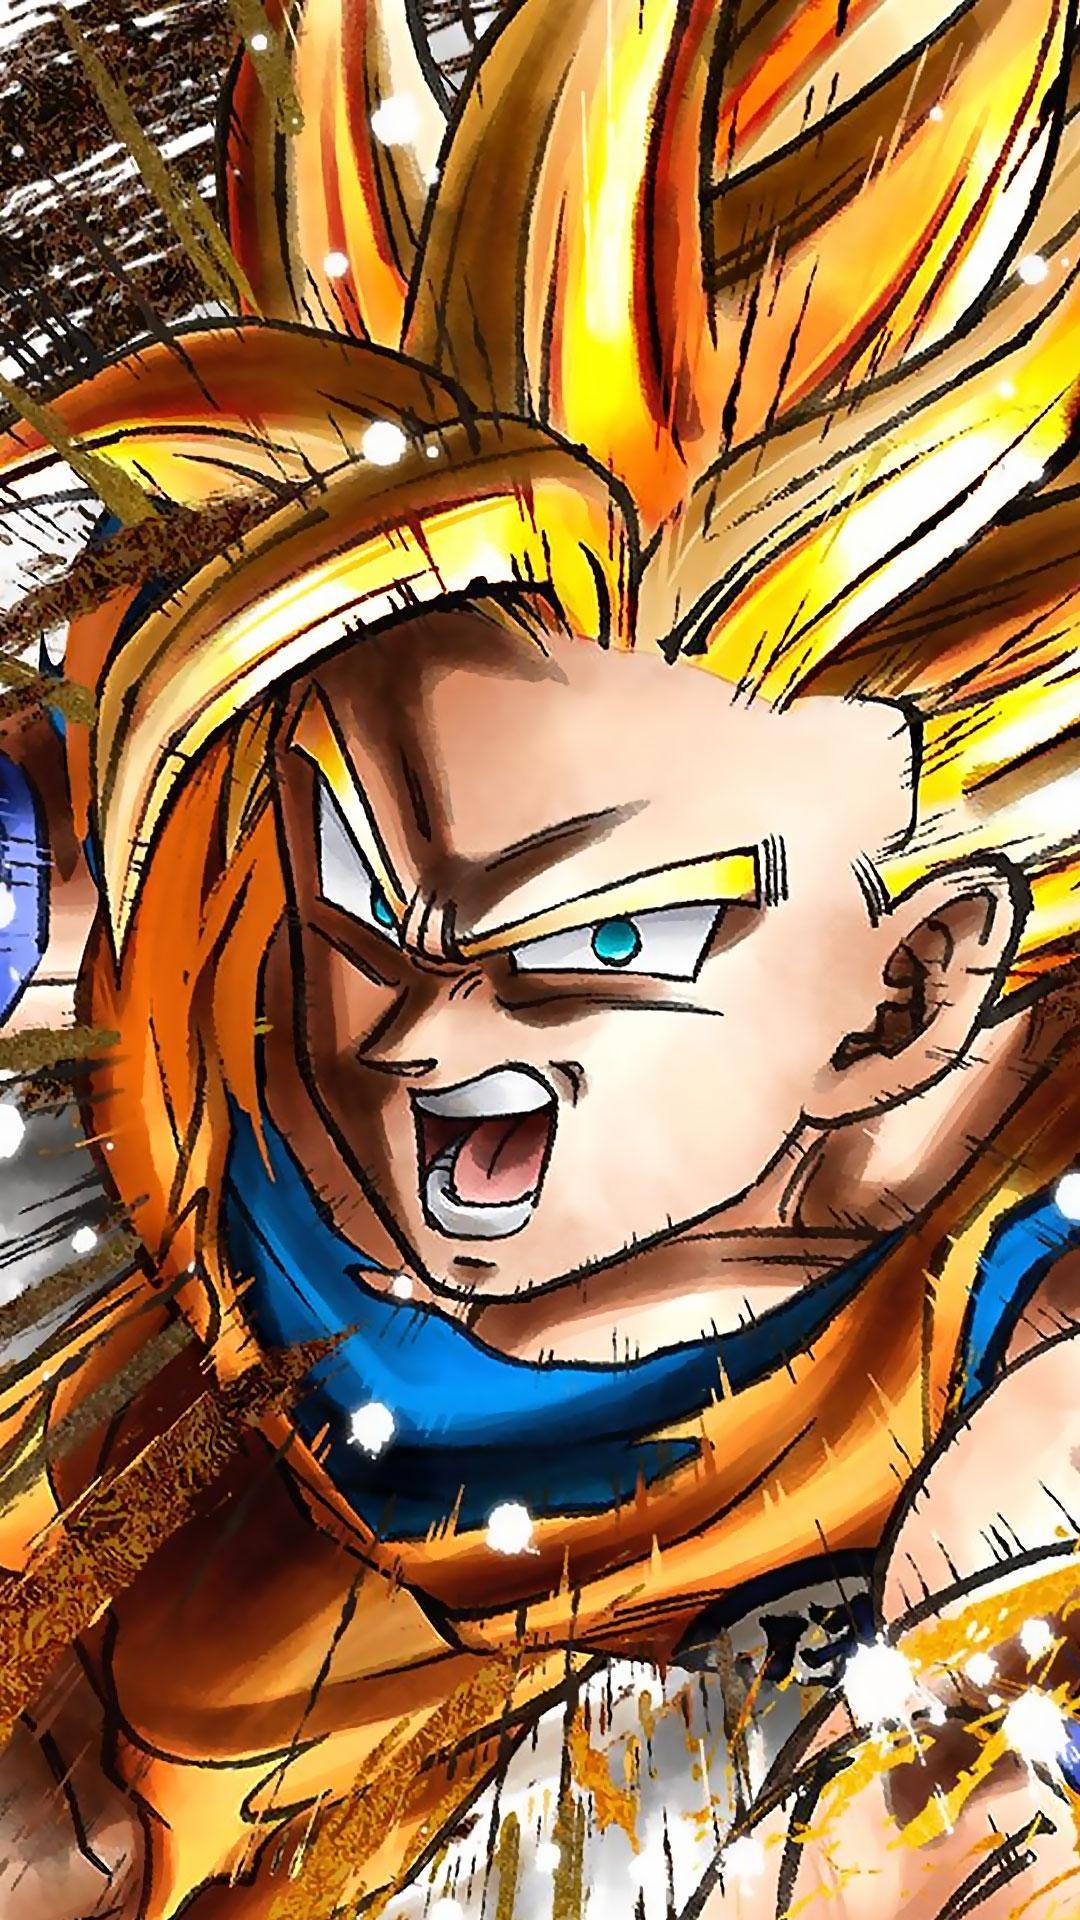 Dragon Ball Z Live Wallpapers on WallpaperDog